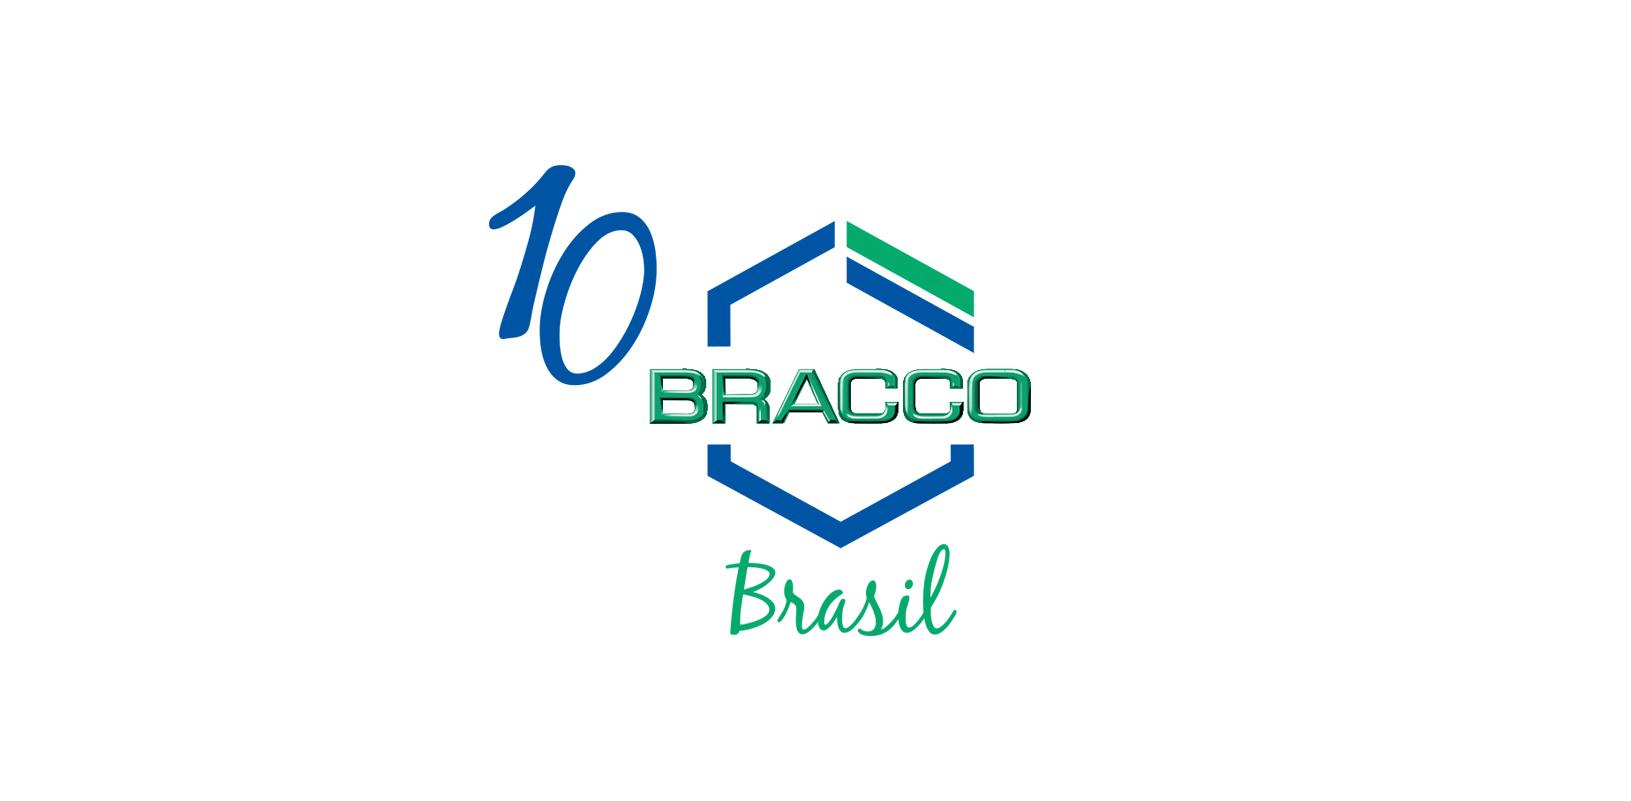 Bracco 10 anos de Brasil